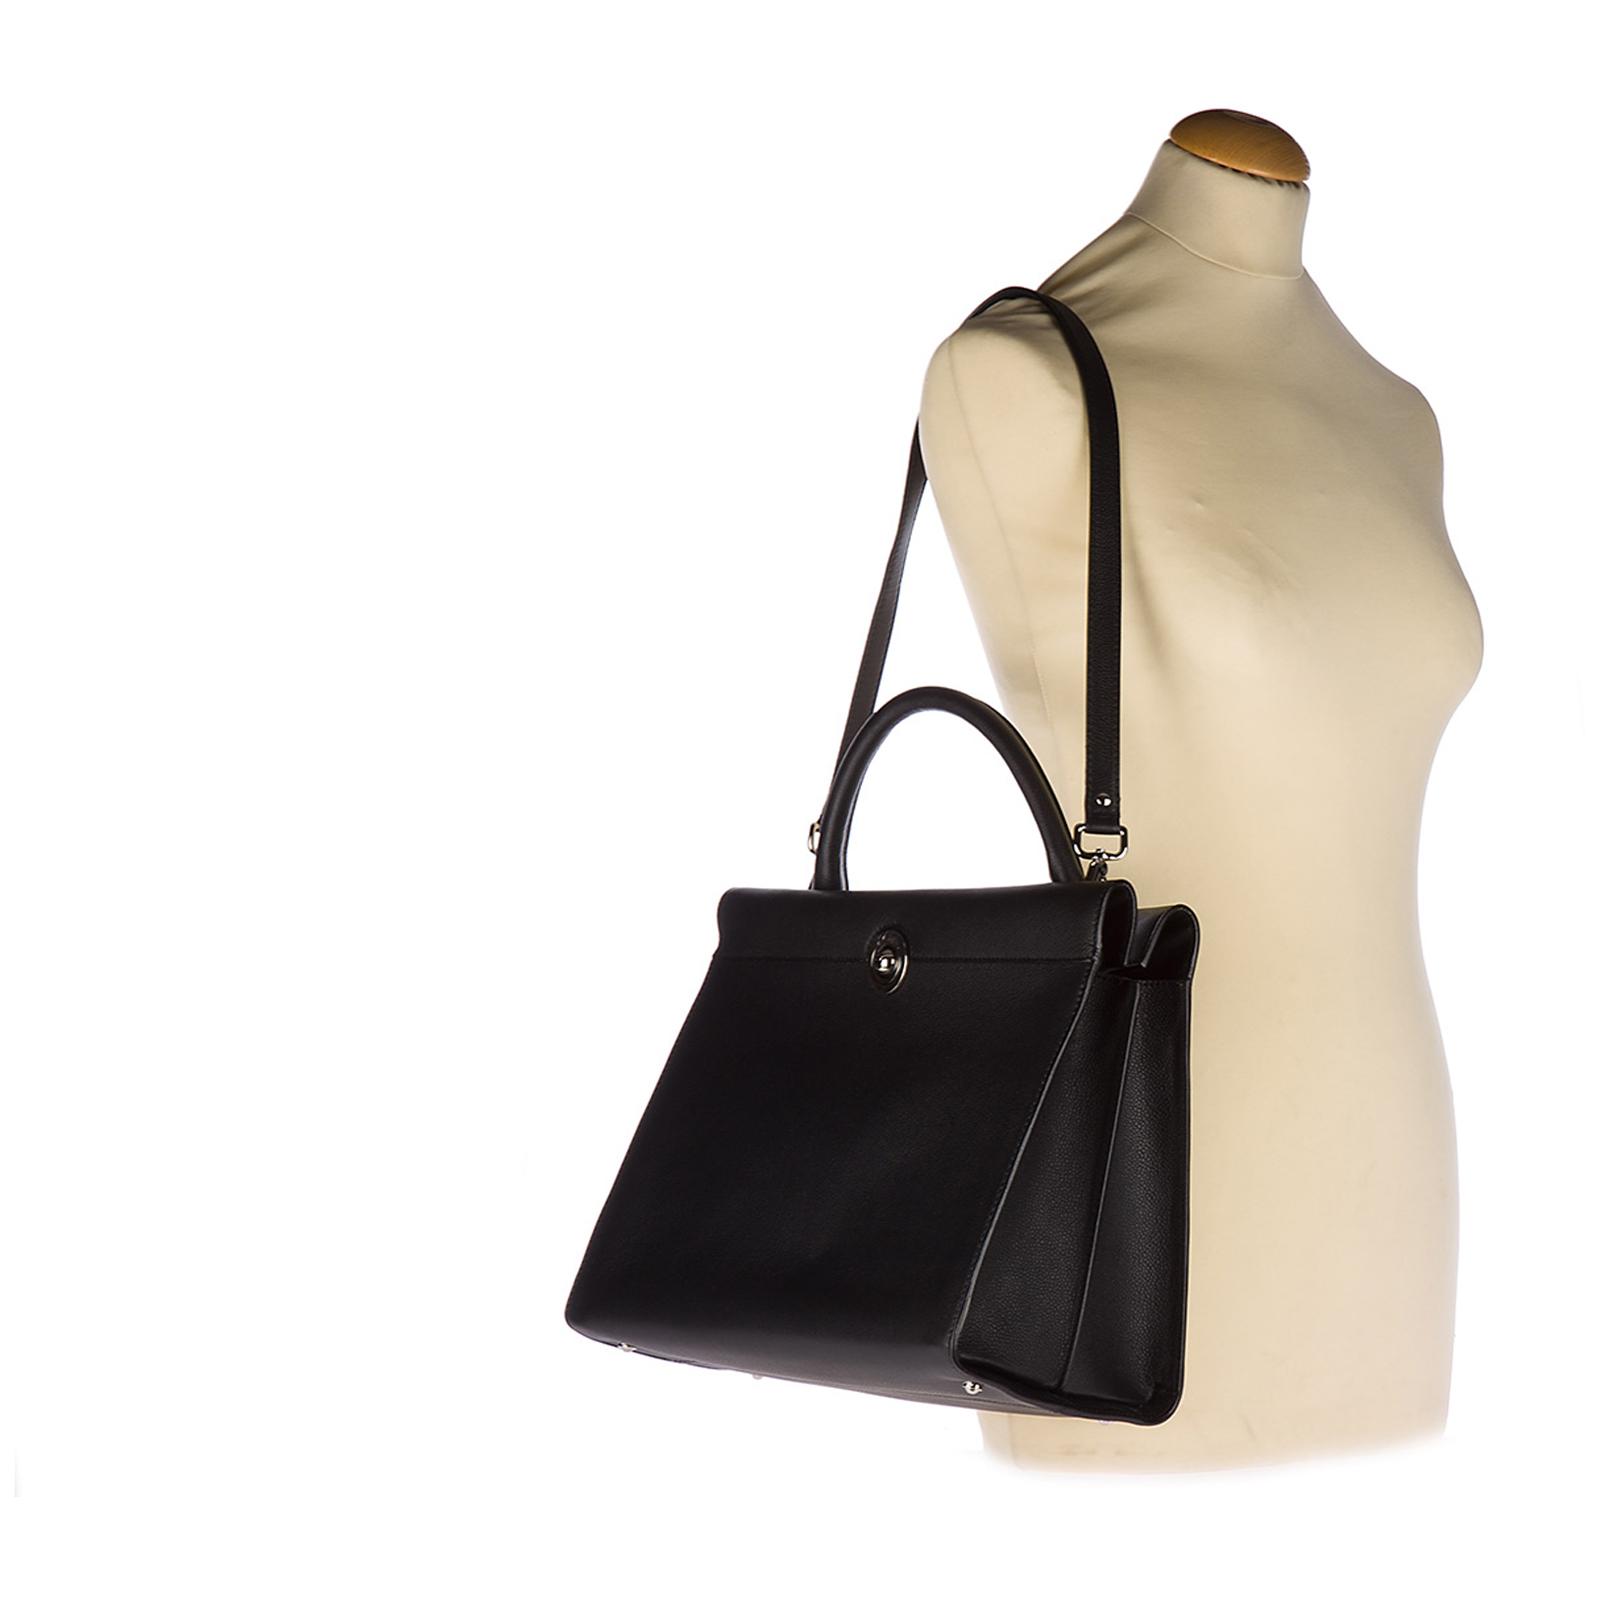 Leder handtasche damen'tasche bag paris